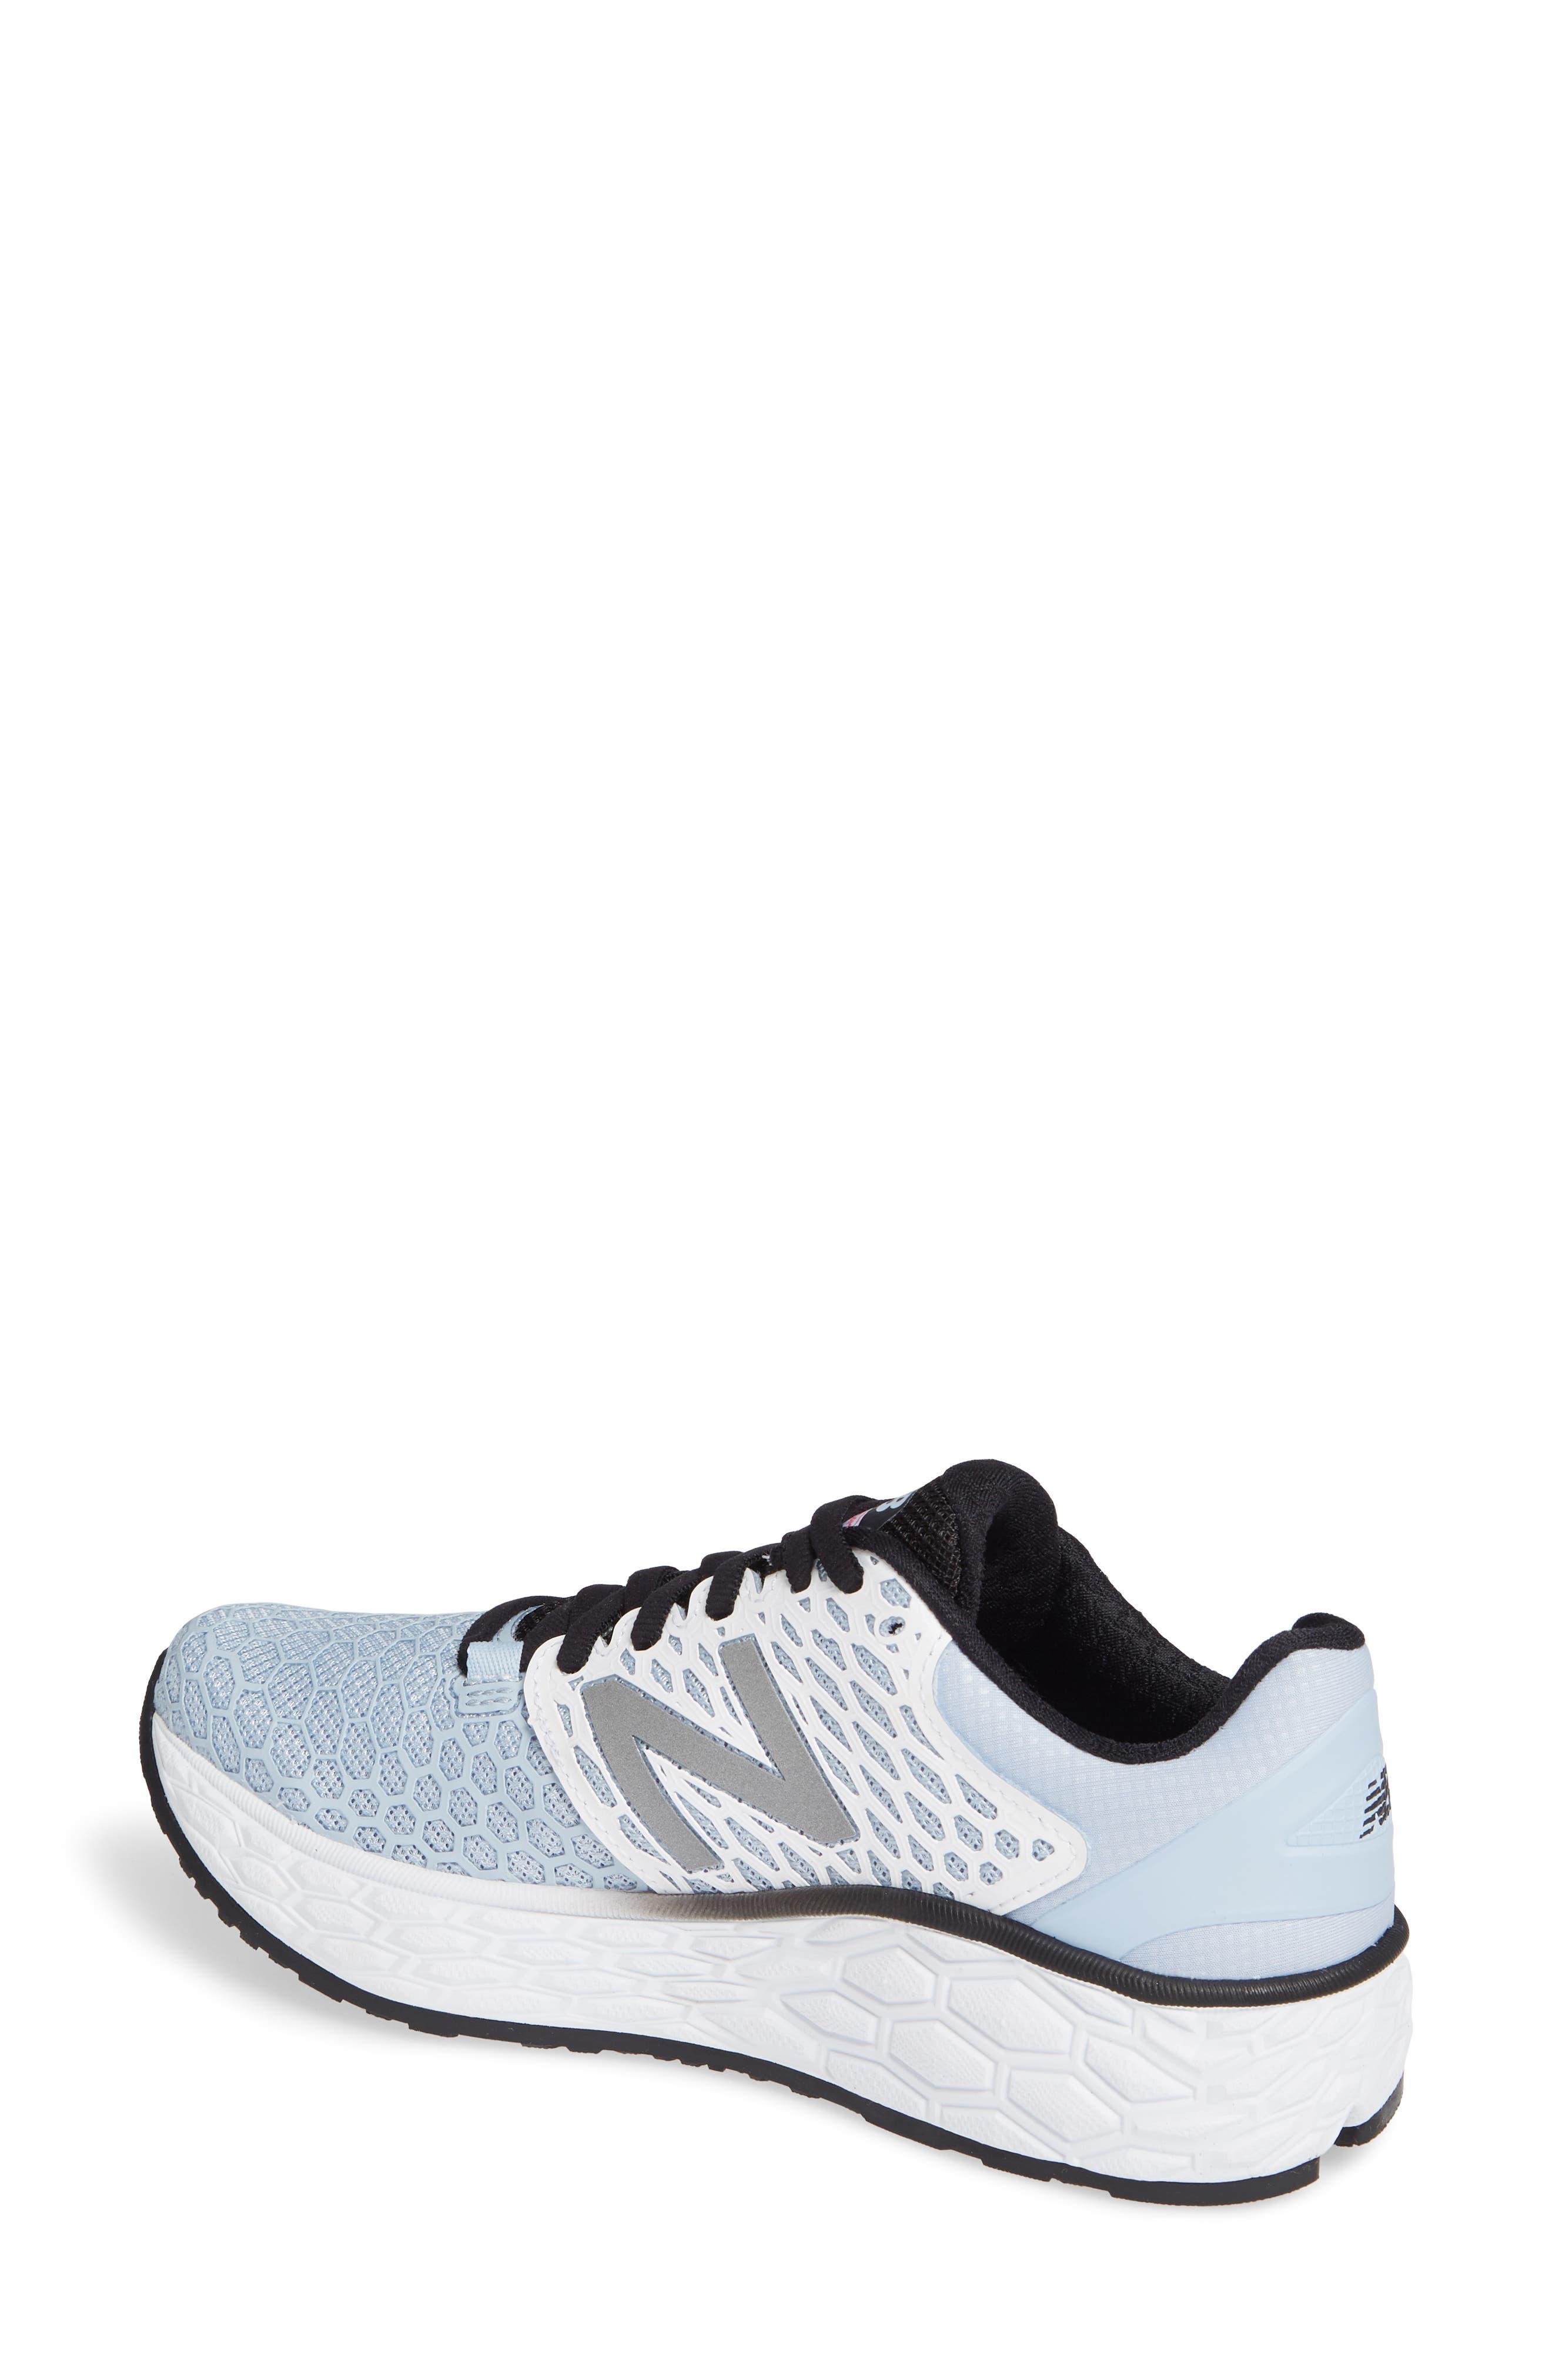 Fresh Foam Vongo Running Shoe,                             Alternate thumbnail 2, color,                             ICE BLUE